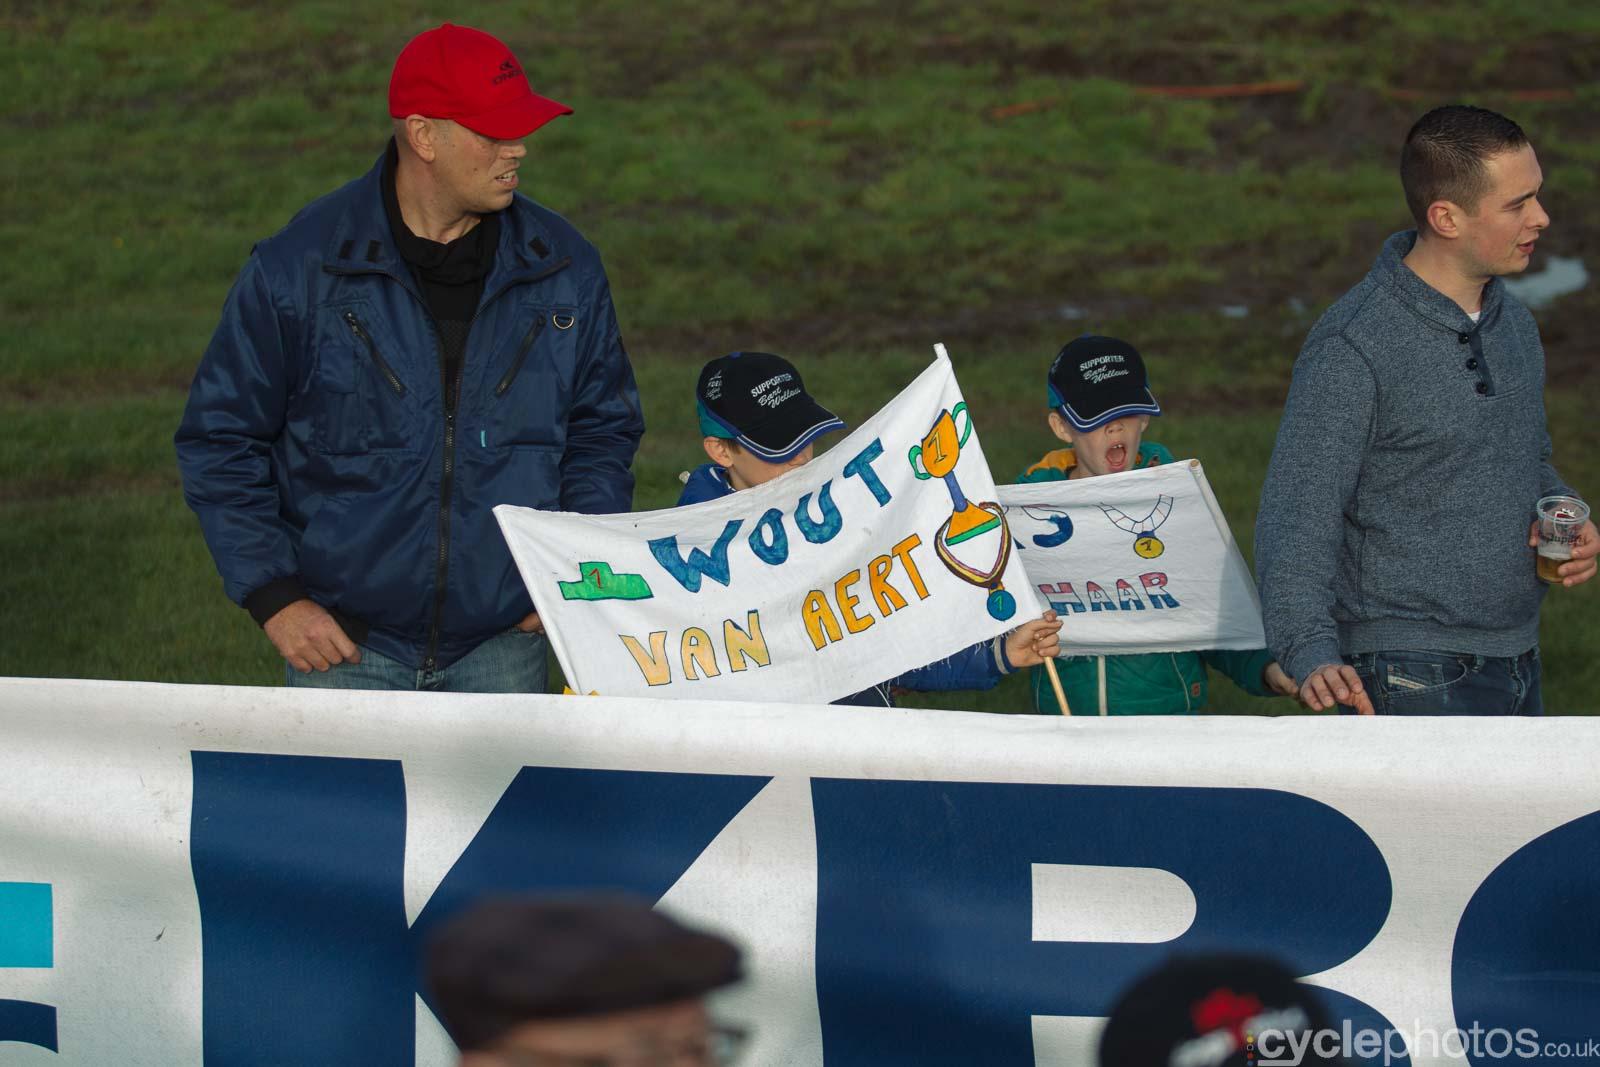 2015-cyclephotos-cyclocross-ruddervoorde-145632-wout-van-aert-supporters